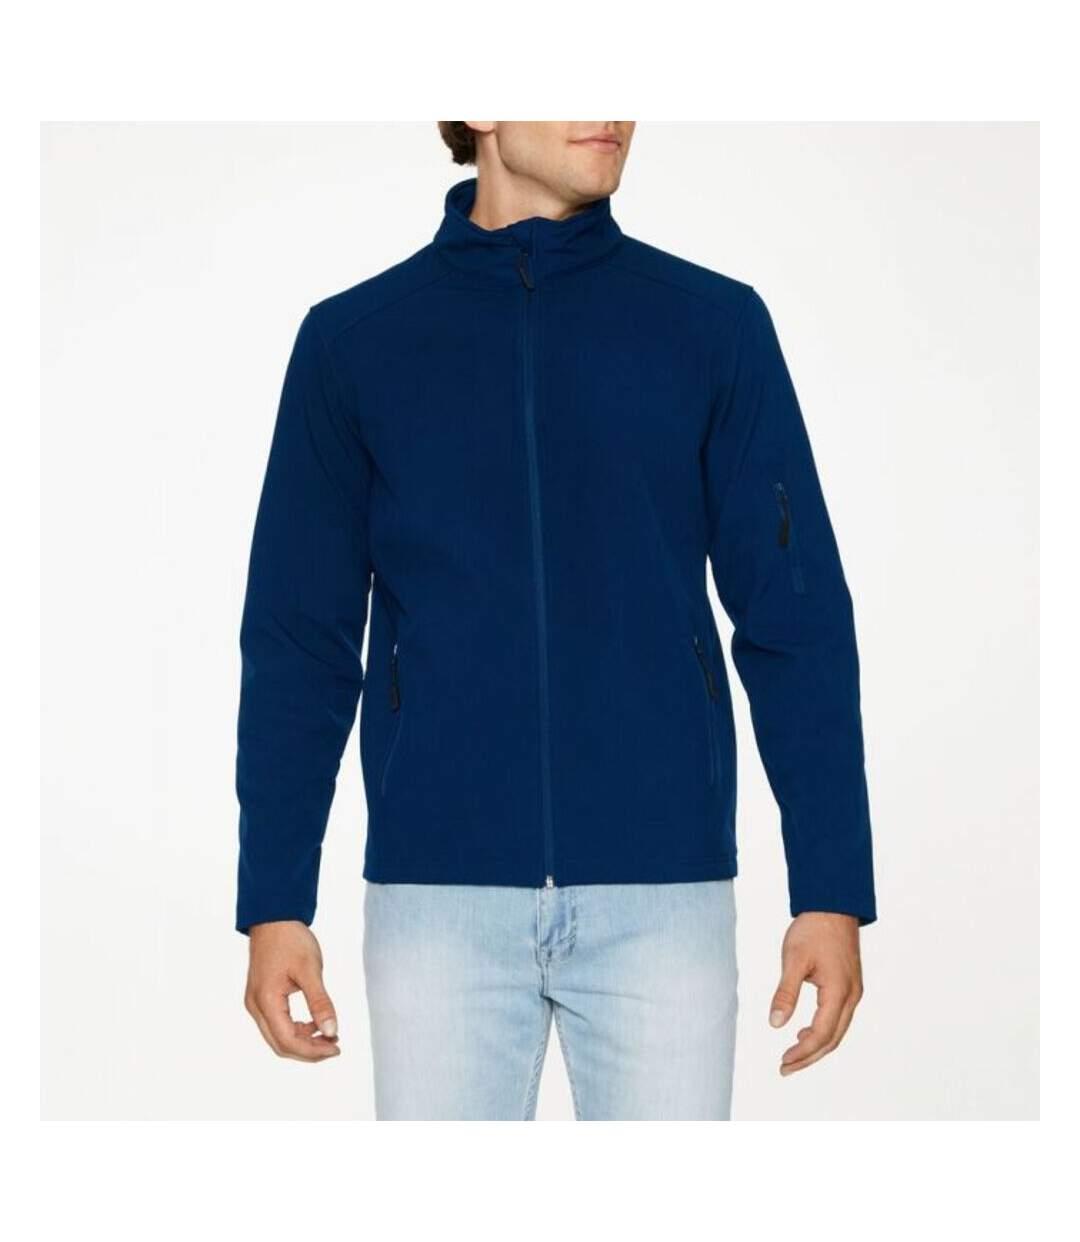 Gildan Mens Hammer Soft Shell Jacket (Orange) - UTPC3990